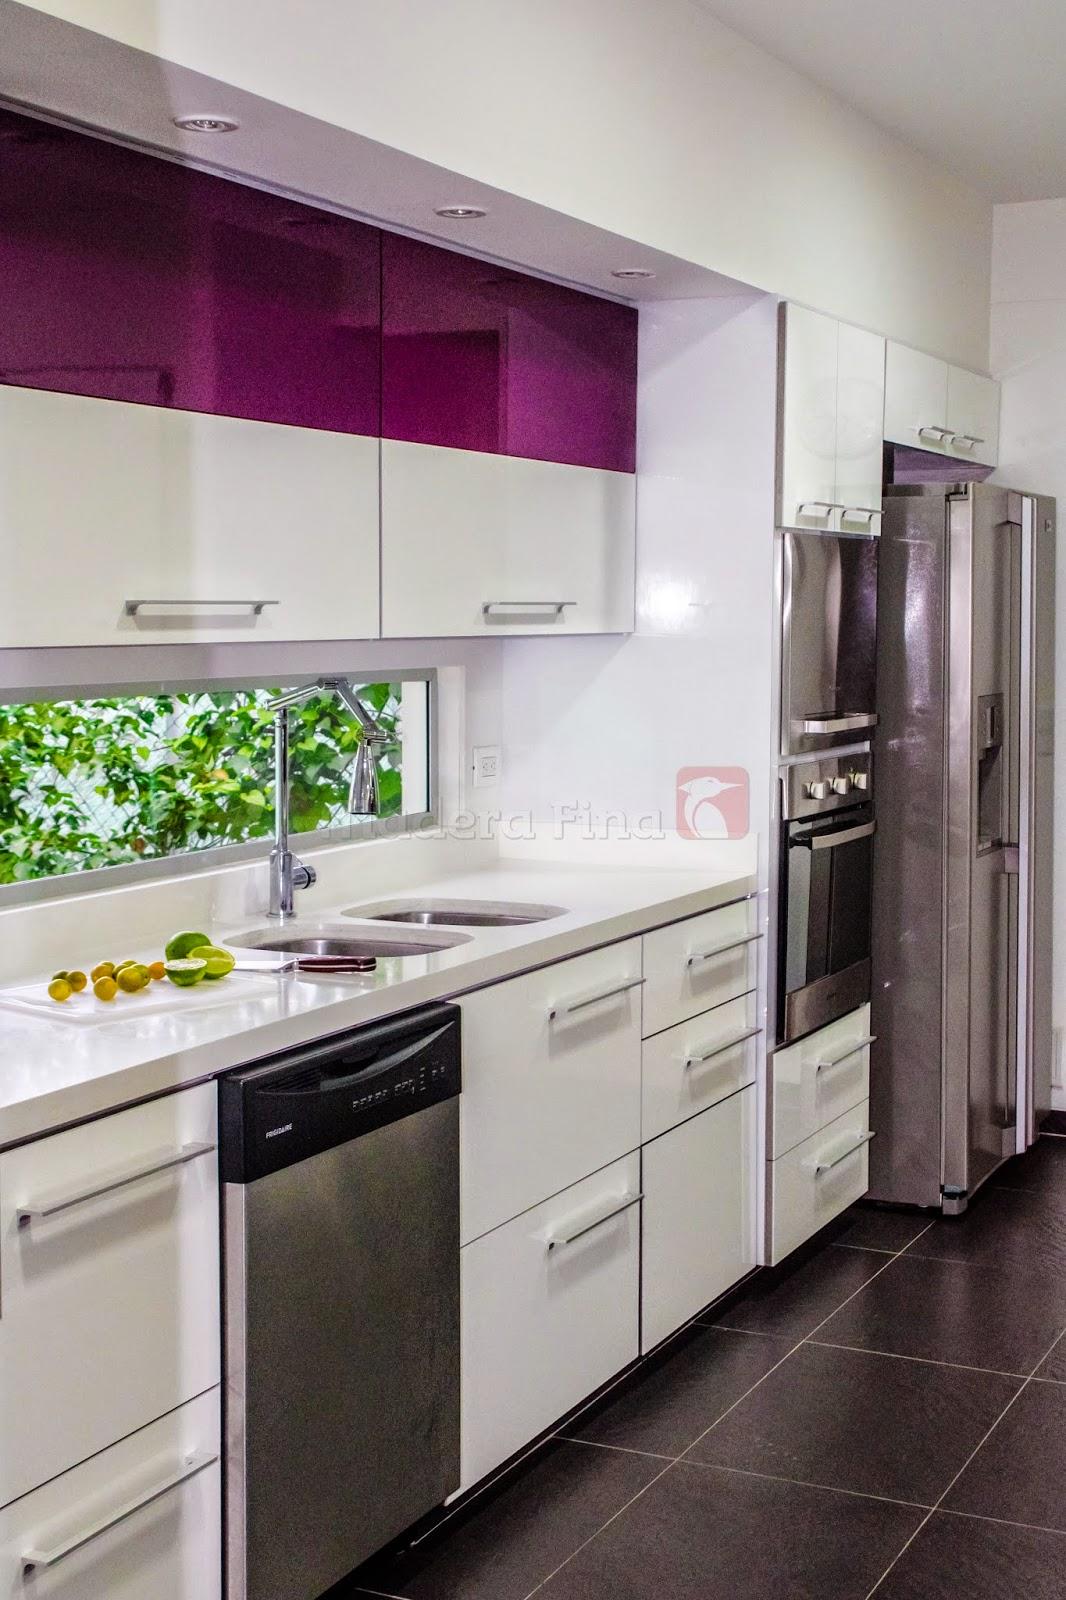 Cocina moderna en pereira morado y blanco cocinas - Cocinas de color blanco ...